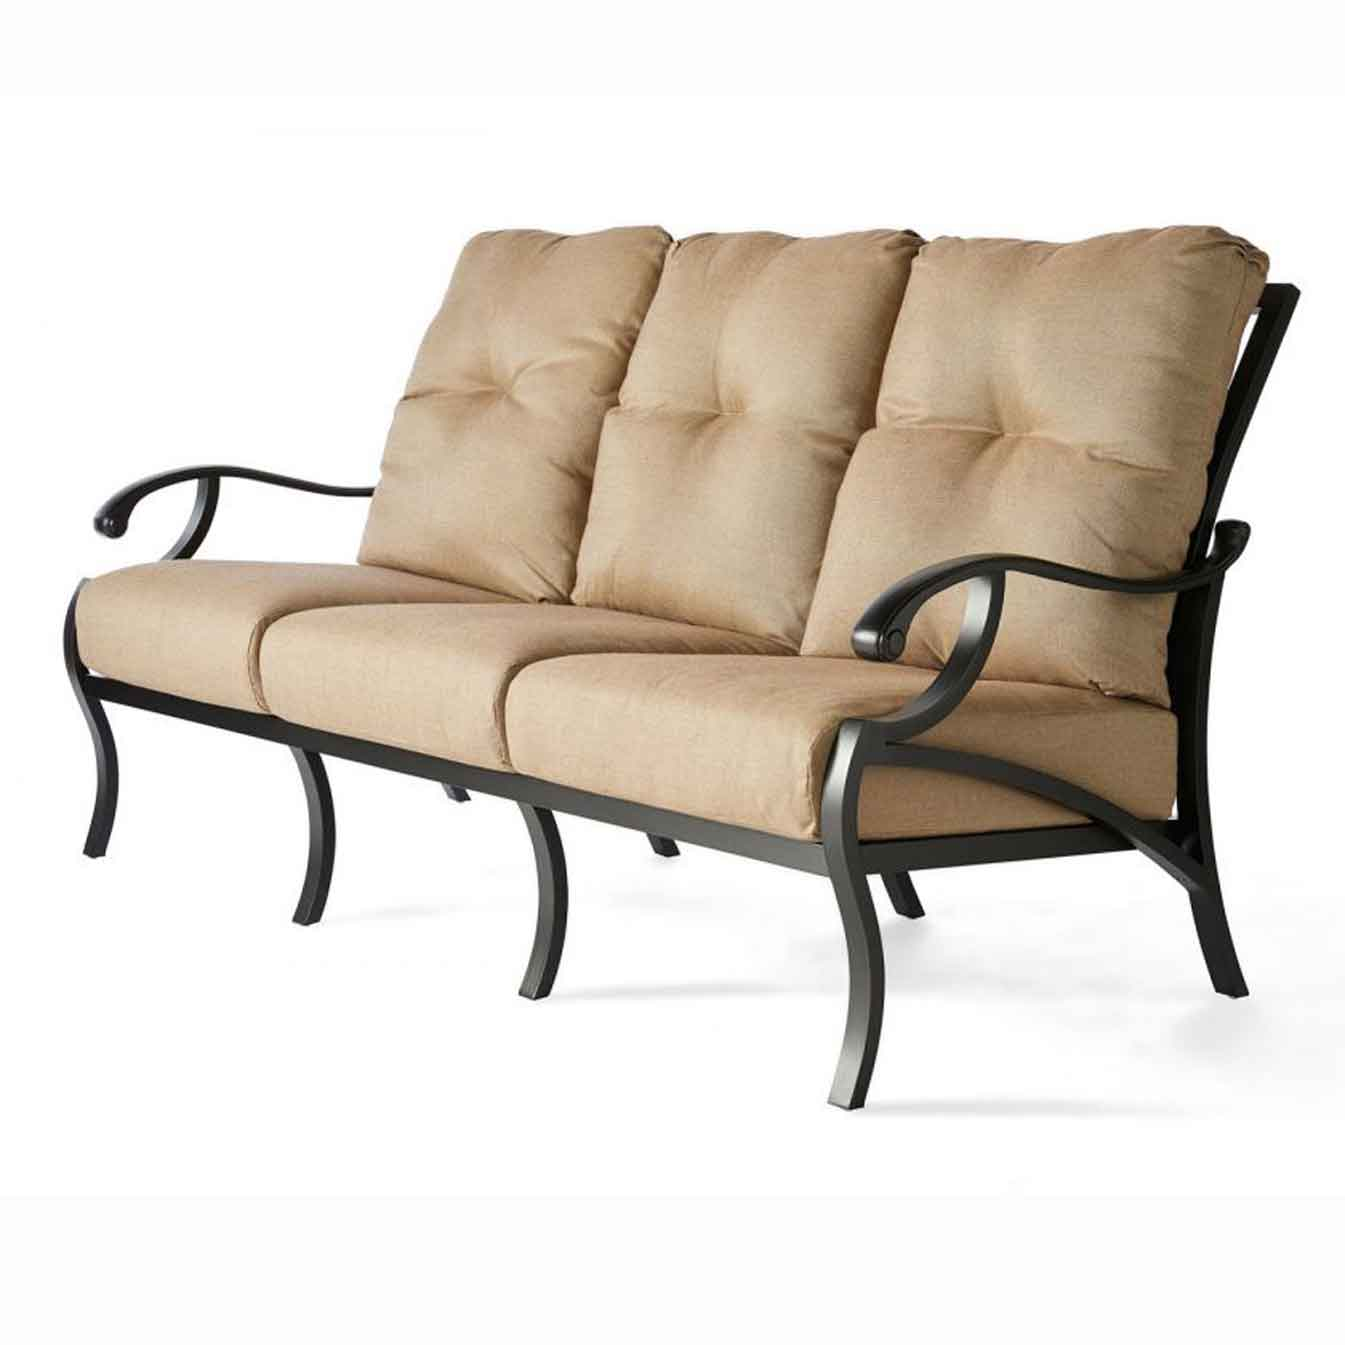 Volare Cushion Sofa - Rochelle Pebble